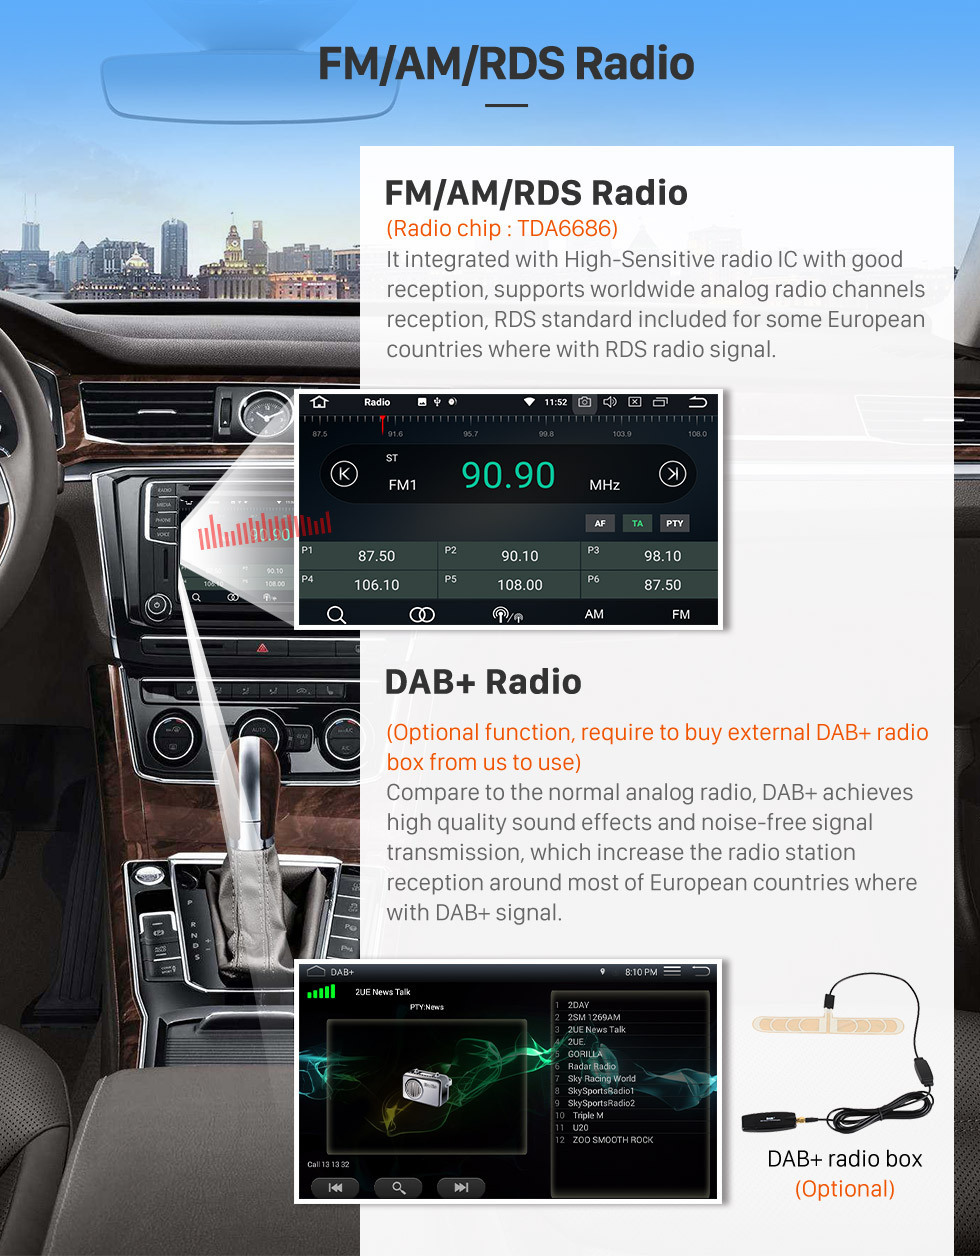 Seicane Double Din PureAndroid 9.0 CD Radio Aftermarket OEM GPS System for 1998-2004 Mercedes-Benz CLK W209 CLK200 CLK230 CLK320 DVD 3G WiFi Mirror Link OBD2 Bluetooth Music